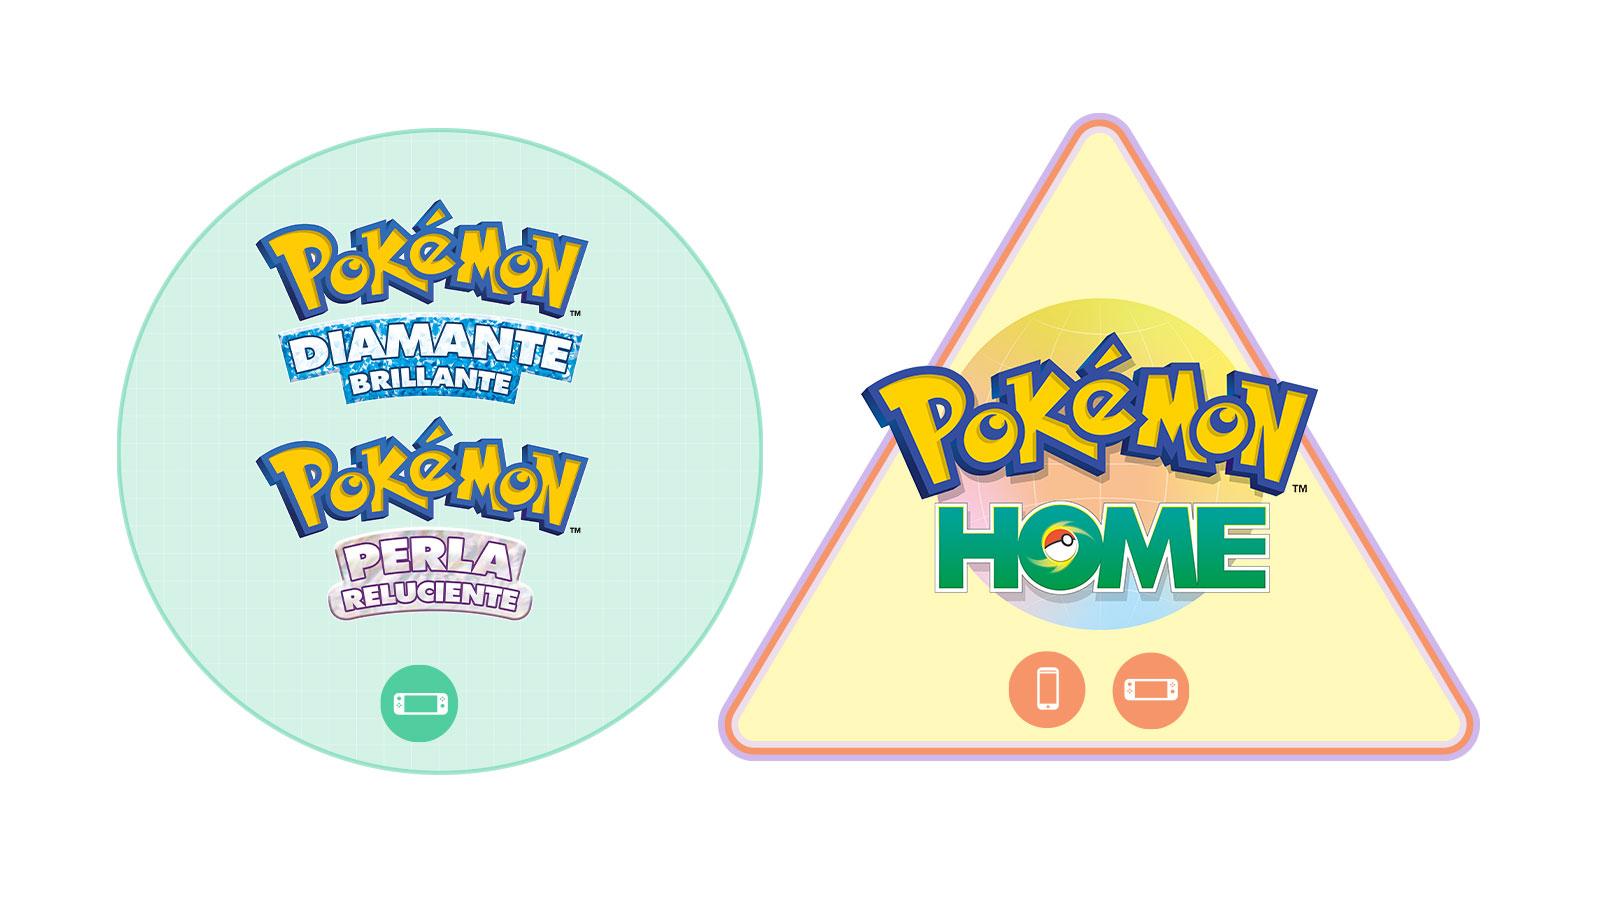 Pokémon Diamante Brillante Perla Reluciente HOME